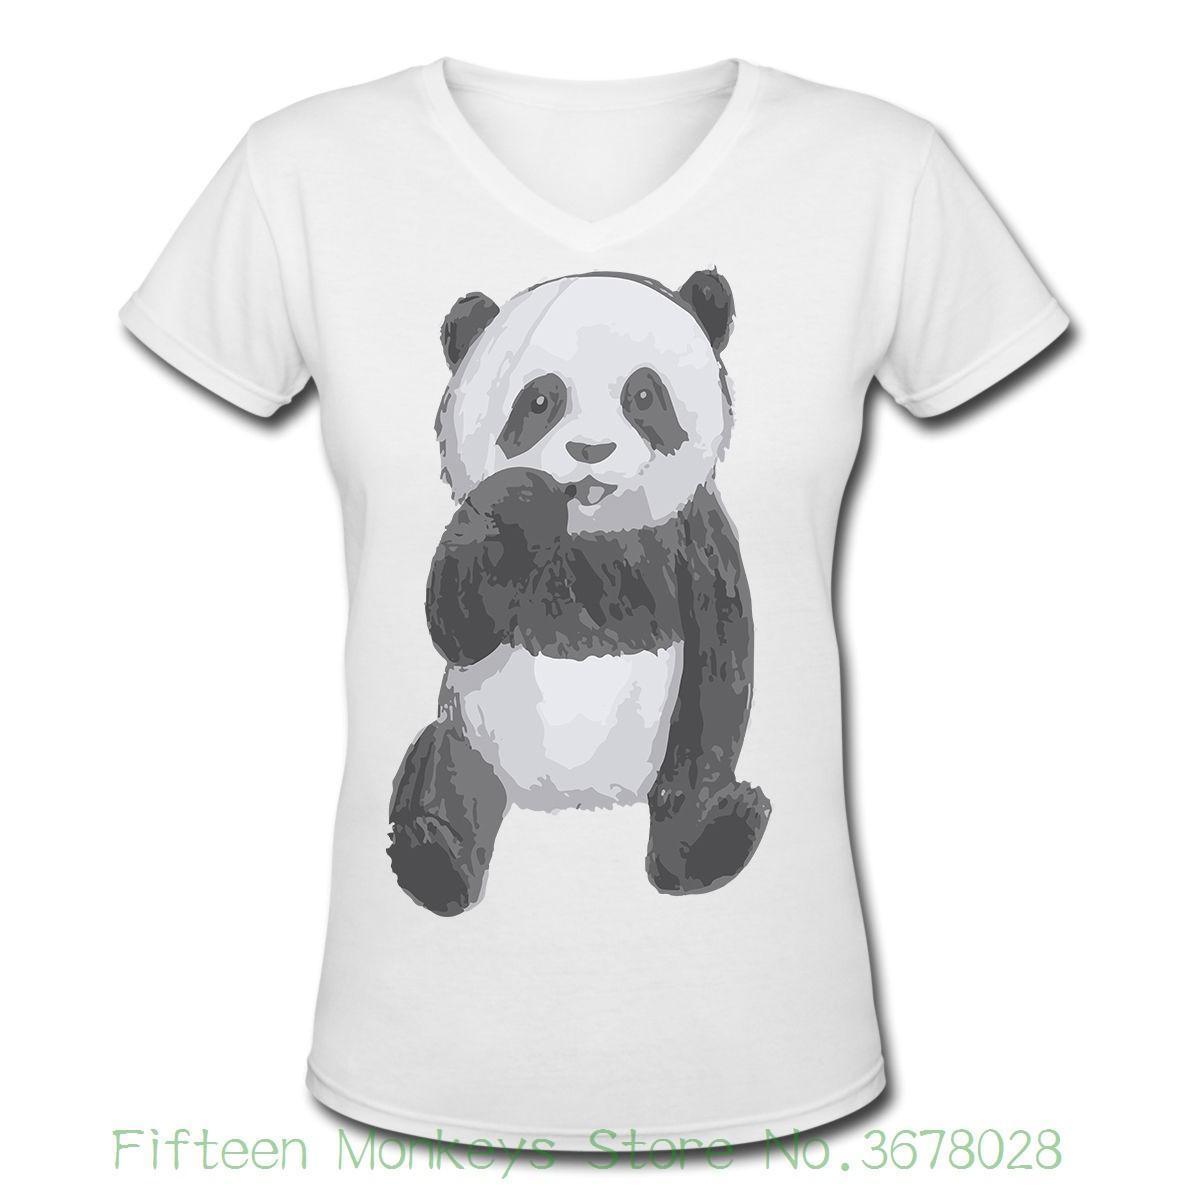 6d4f9e5822d Women S Tee Panda Bear Cute Cub Animal Drawing Women S T Shirt O Neck White  Summer Style Hip Hop Brand Tees T Shirt Prints T Shirt Designing From  Jie72